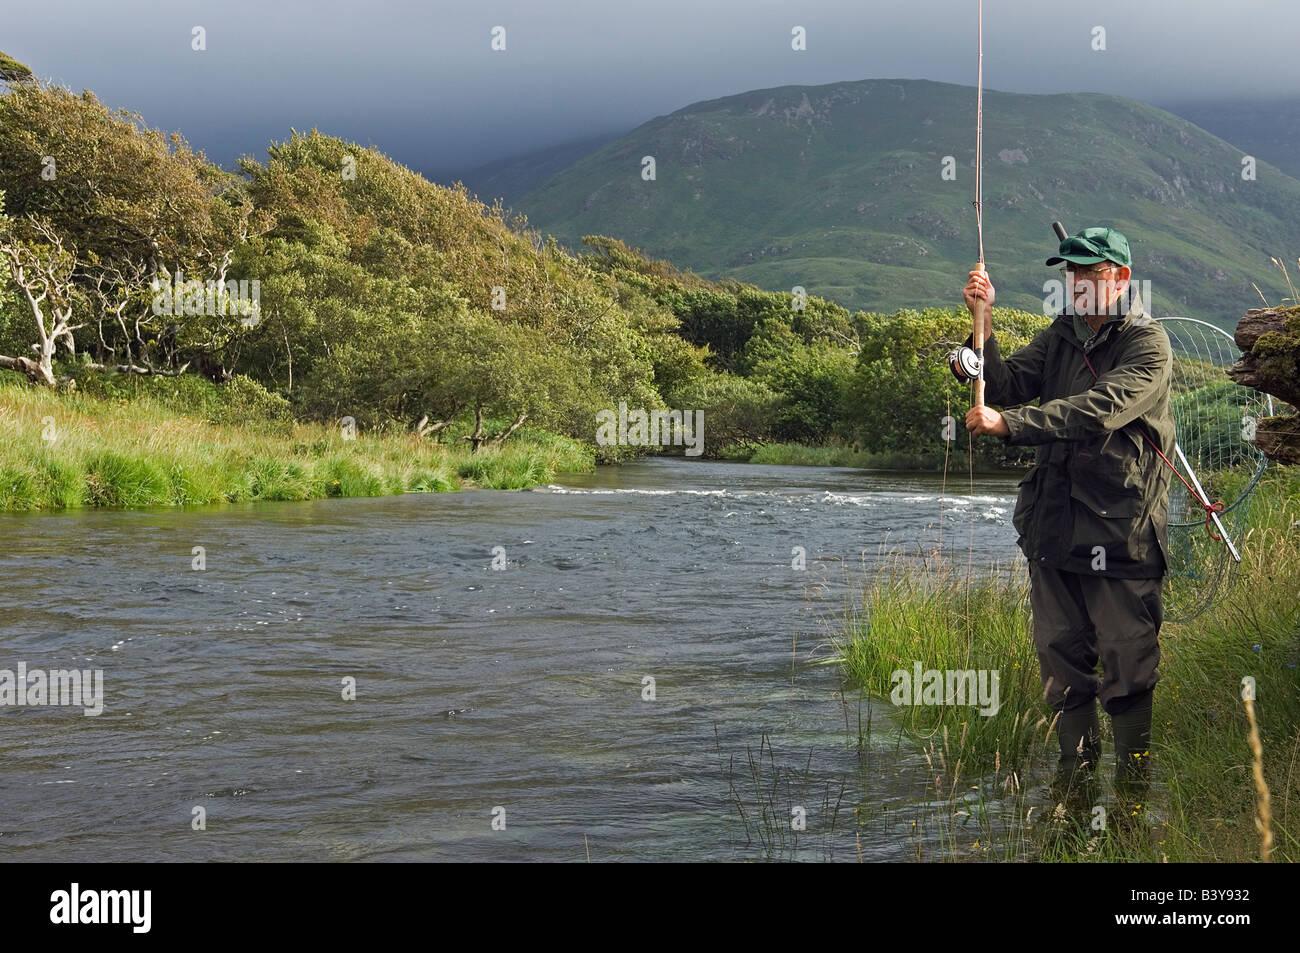 scotland-hebrides-mull-a-salmon-fisherma